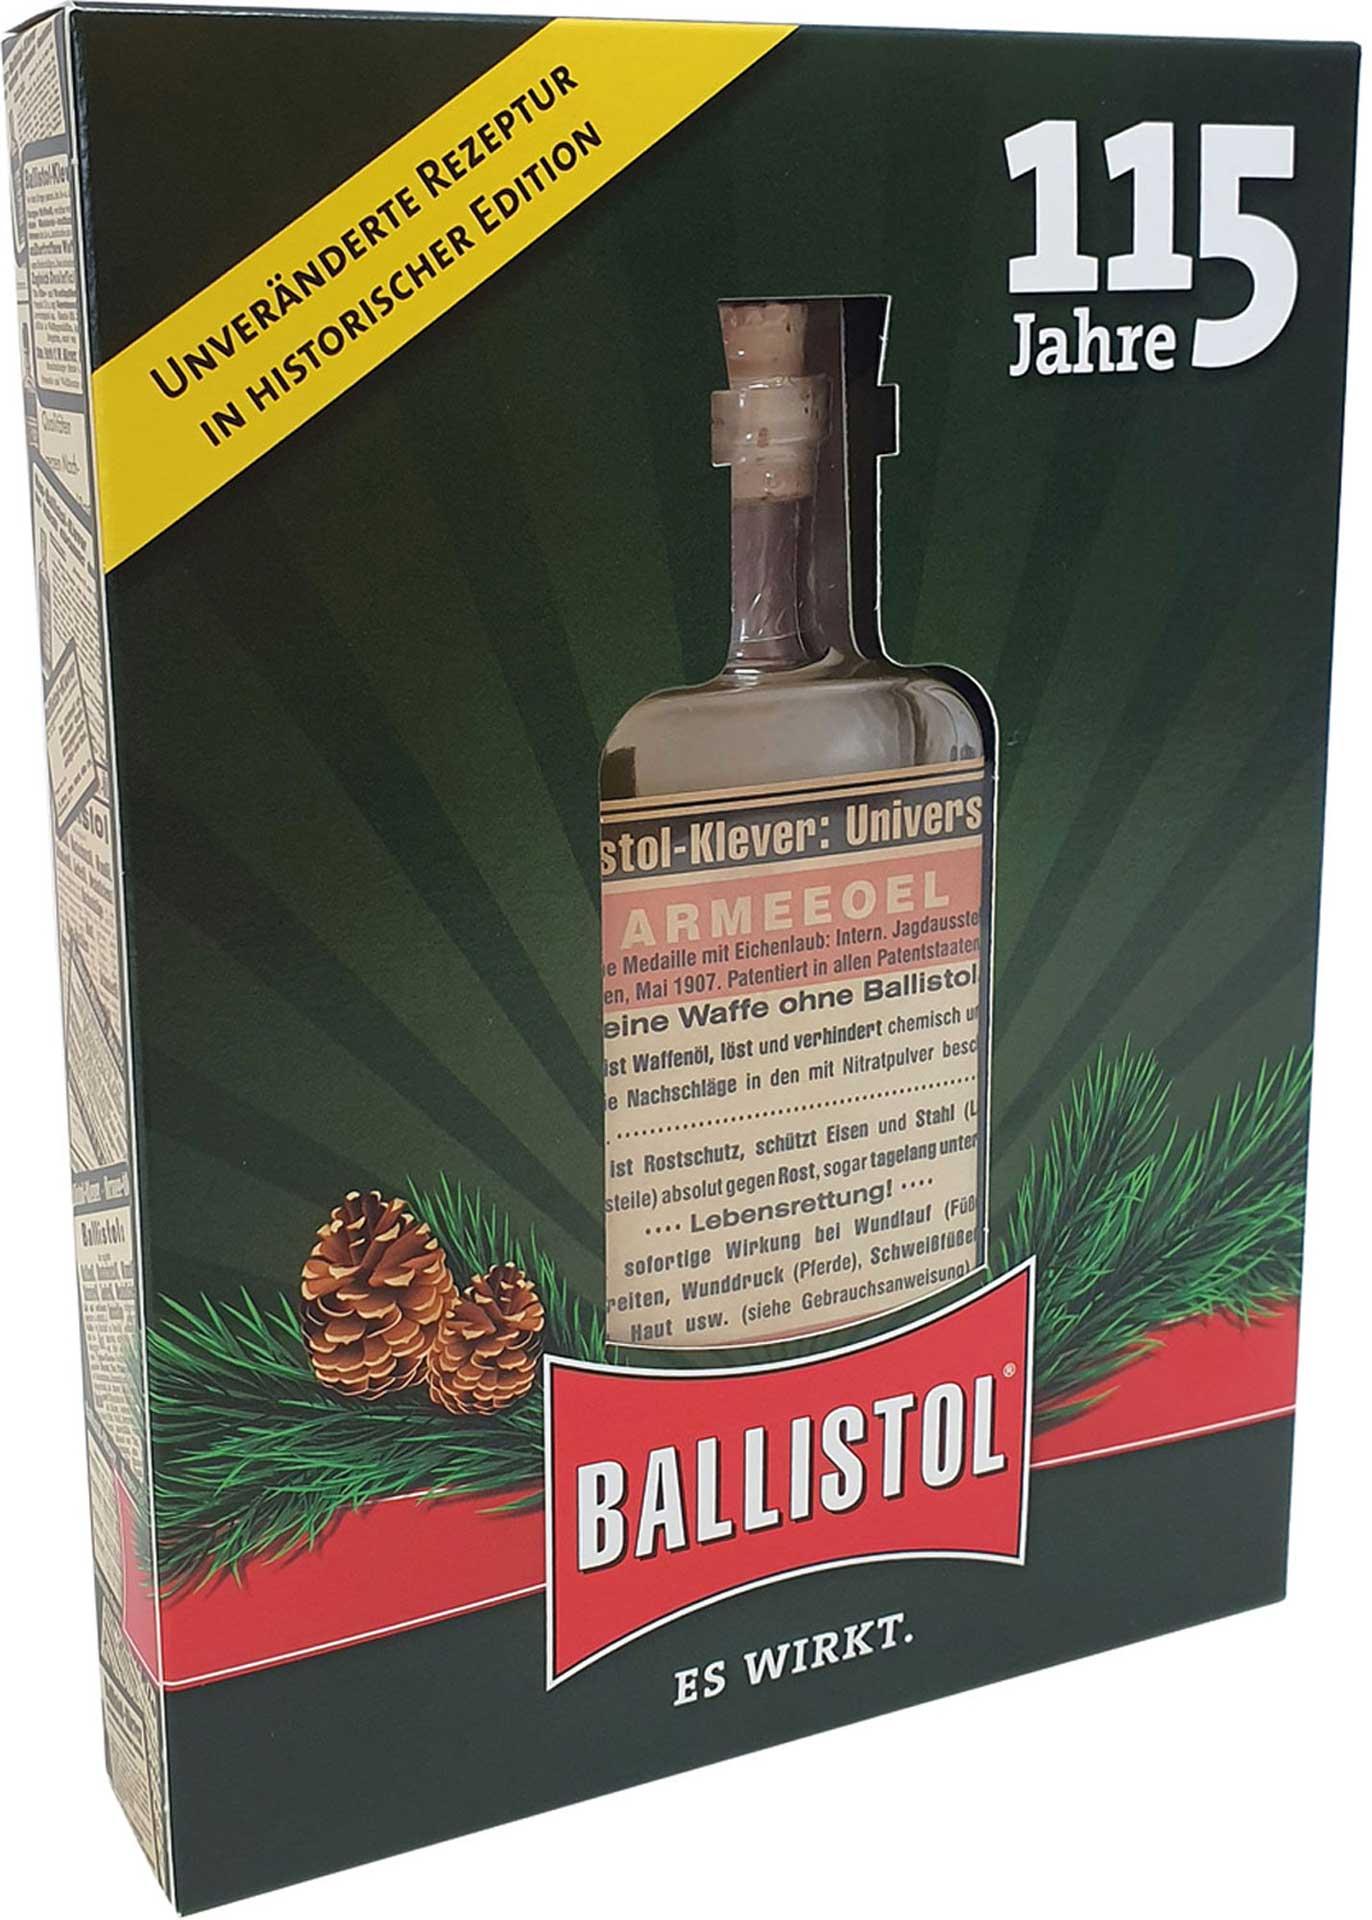 UNIVERSAL OIL 100ML 115 YEARS BALLISTOL IN NOSTALGIA GLASS BOTTL AND GIFT BOX